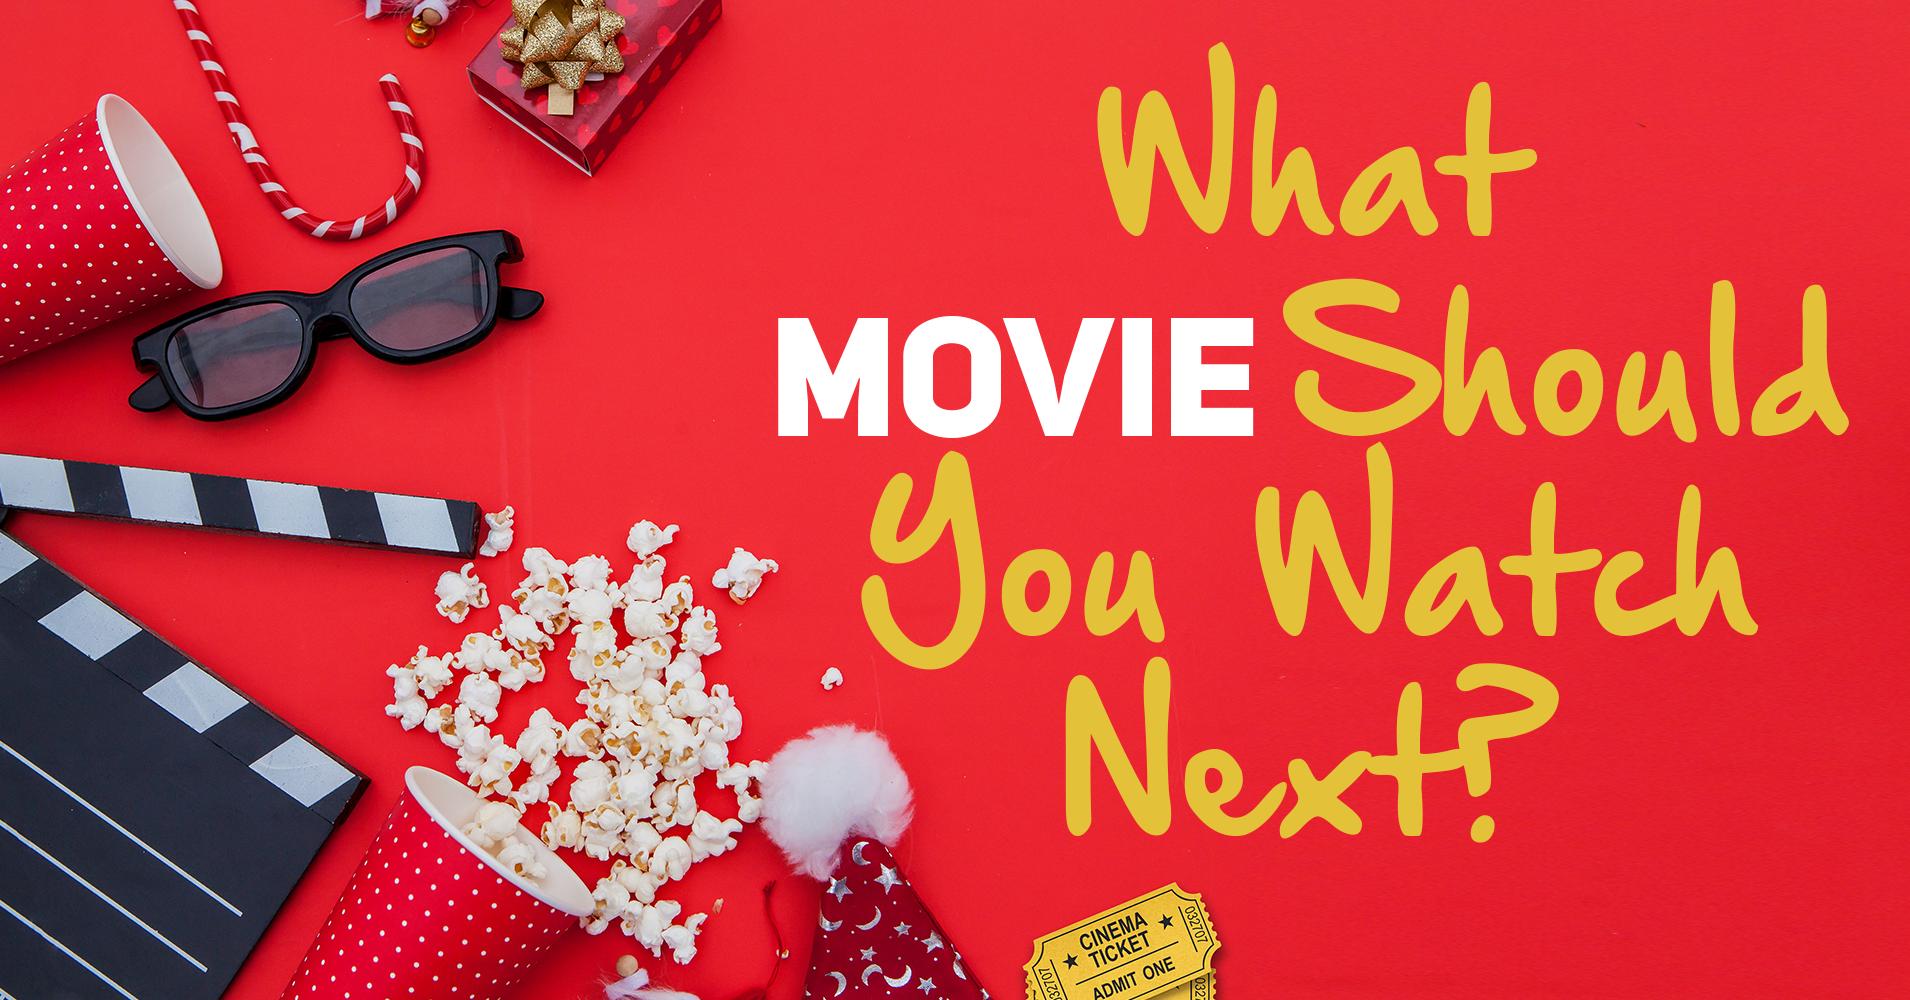 What Movie Should You Watch Next? - Quiz - Quizony com